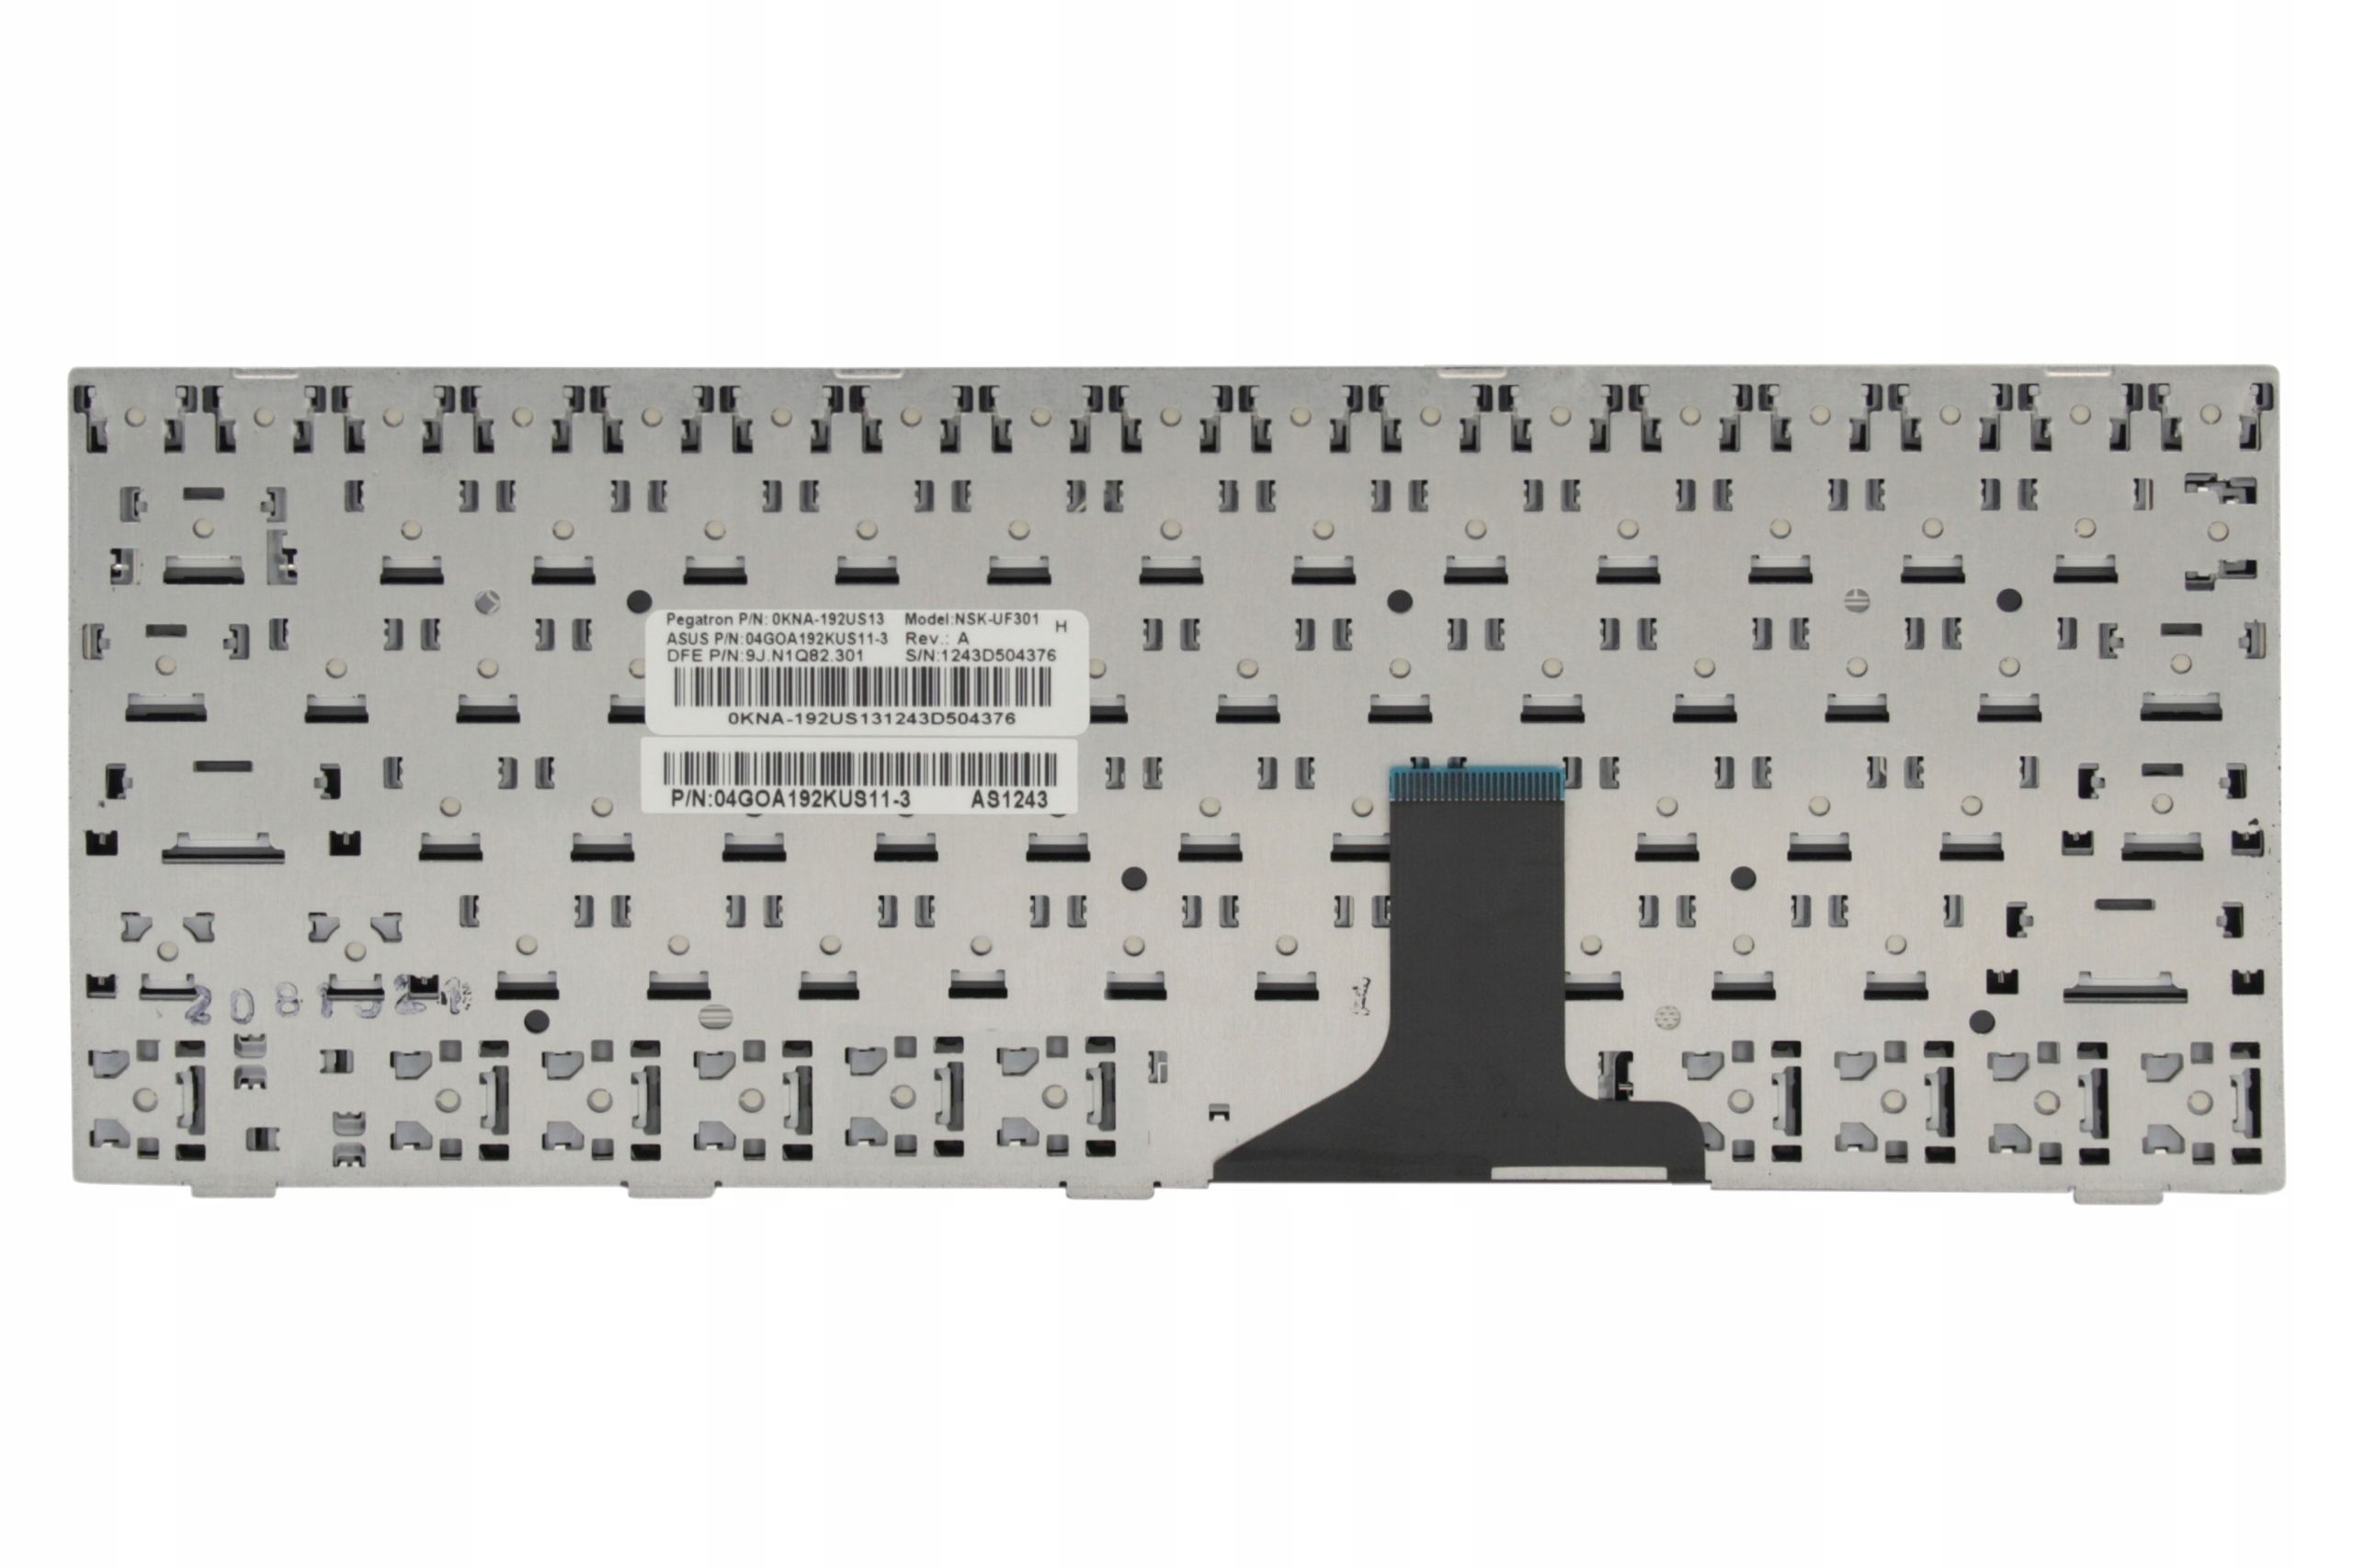 KLAWIATURA ASUS EEE PC 1001P-1H 1001PXB 1001PXD - Klawiatury do laptopów